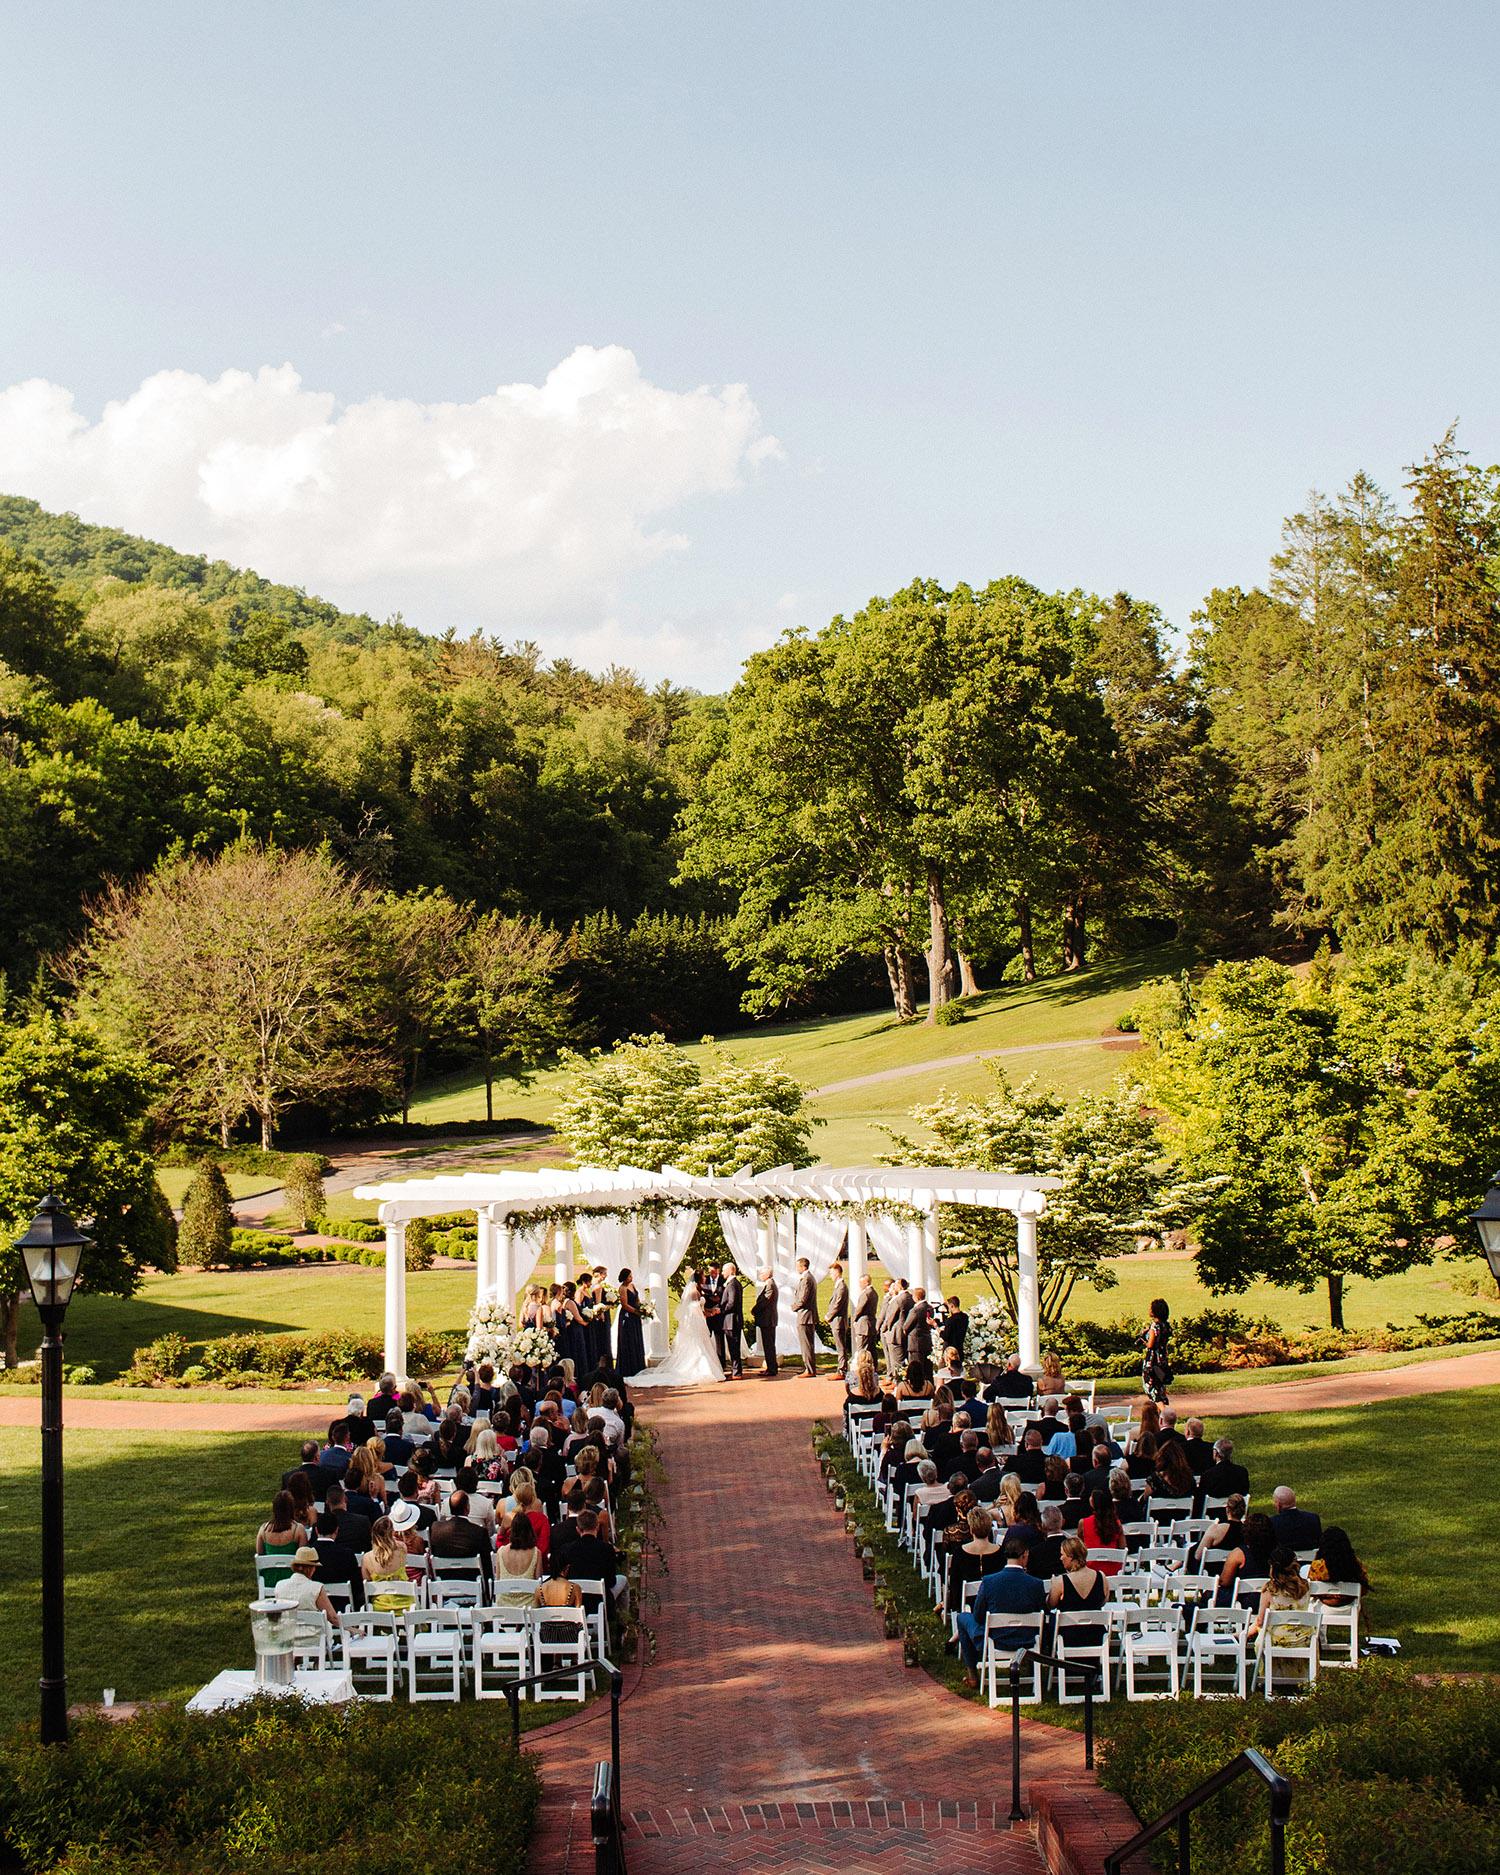 bryanna nick wedding couple outdoor ceremony